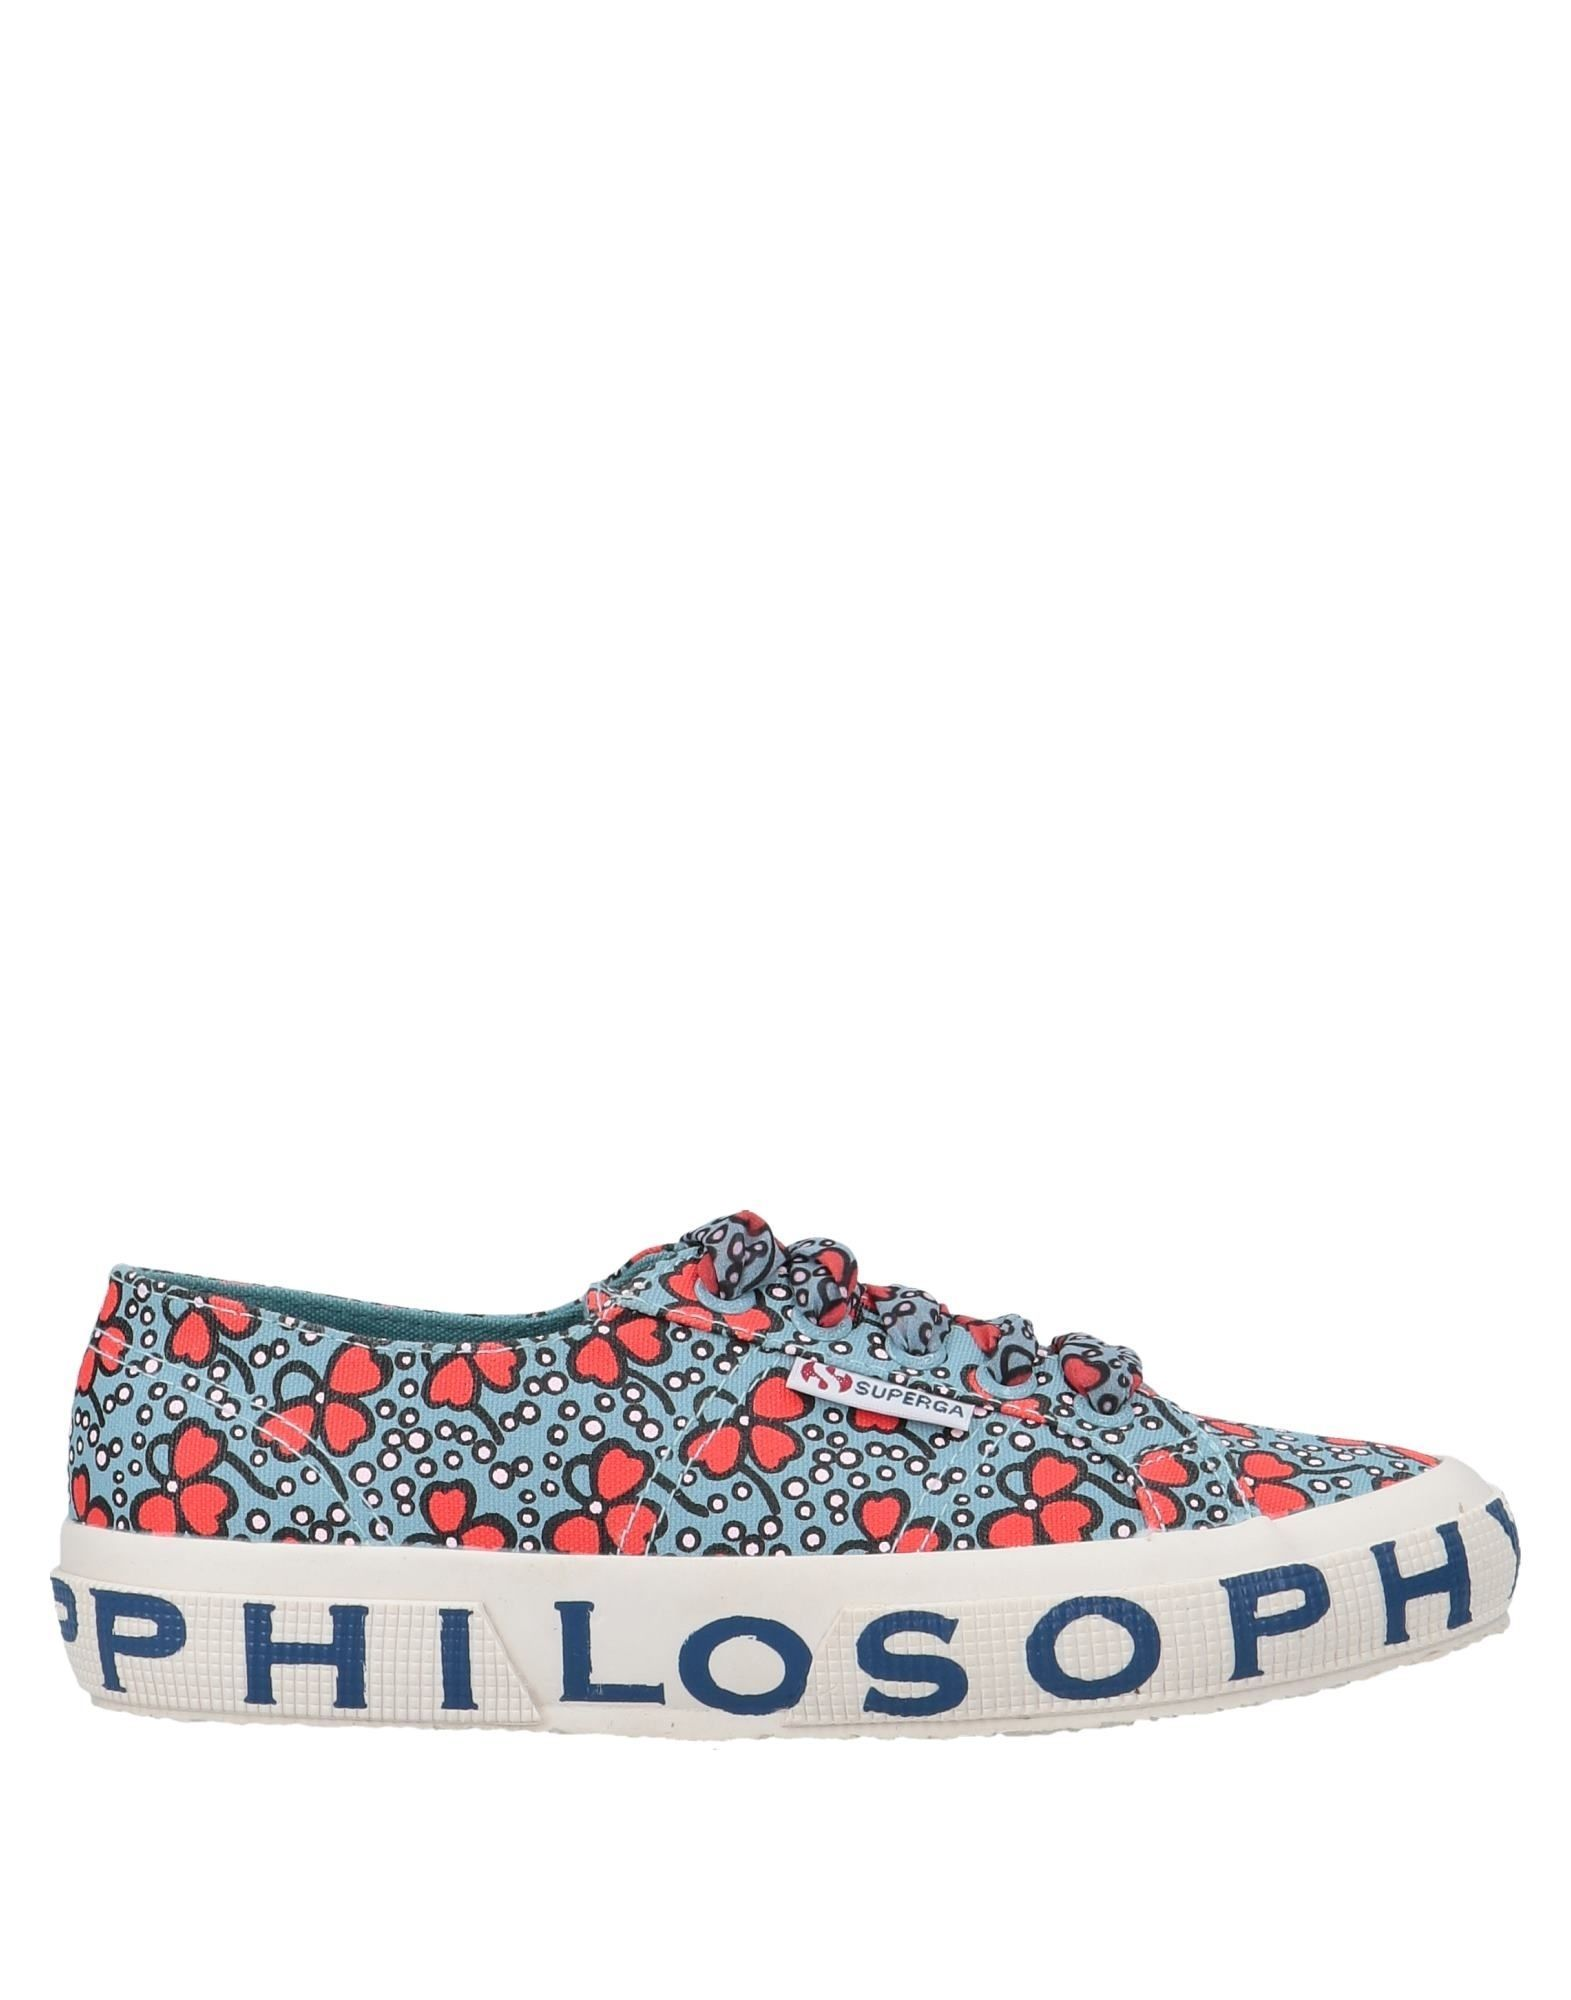 Superga X Philosophy Di Lorenzo Serafini Azure Floral Design Cotton Canvas Sneakers